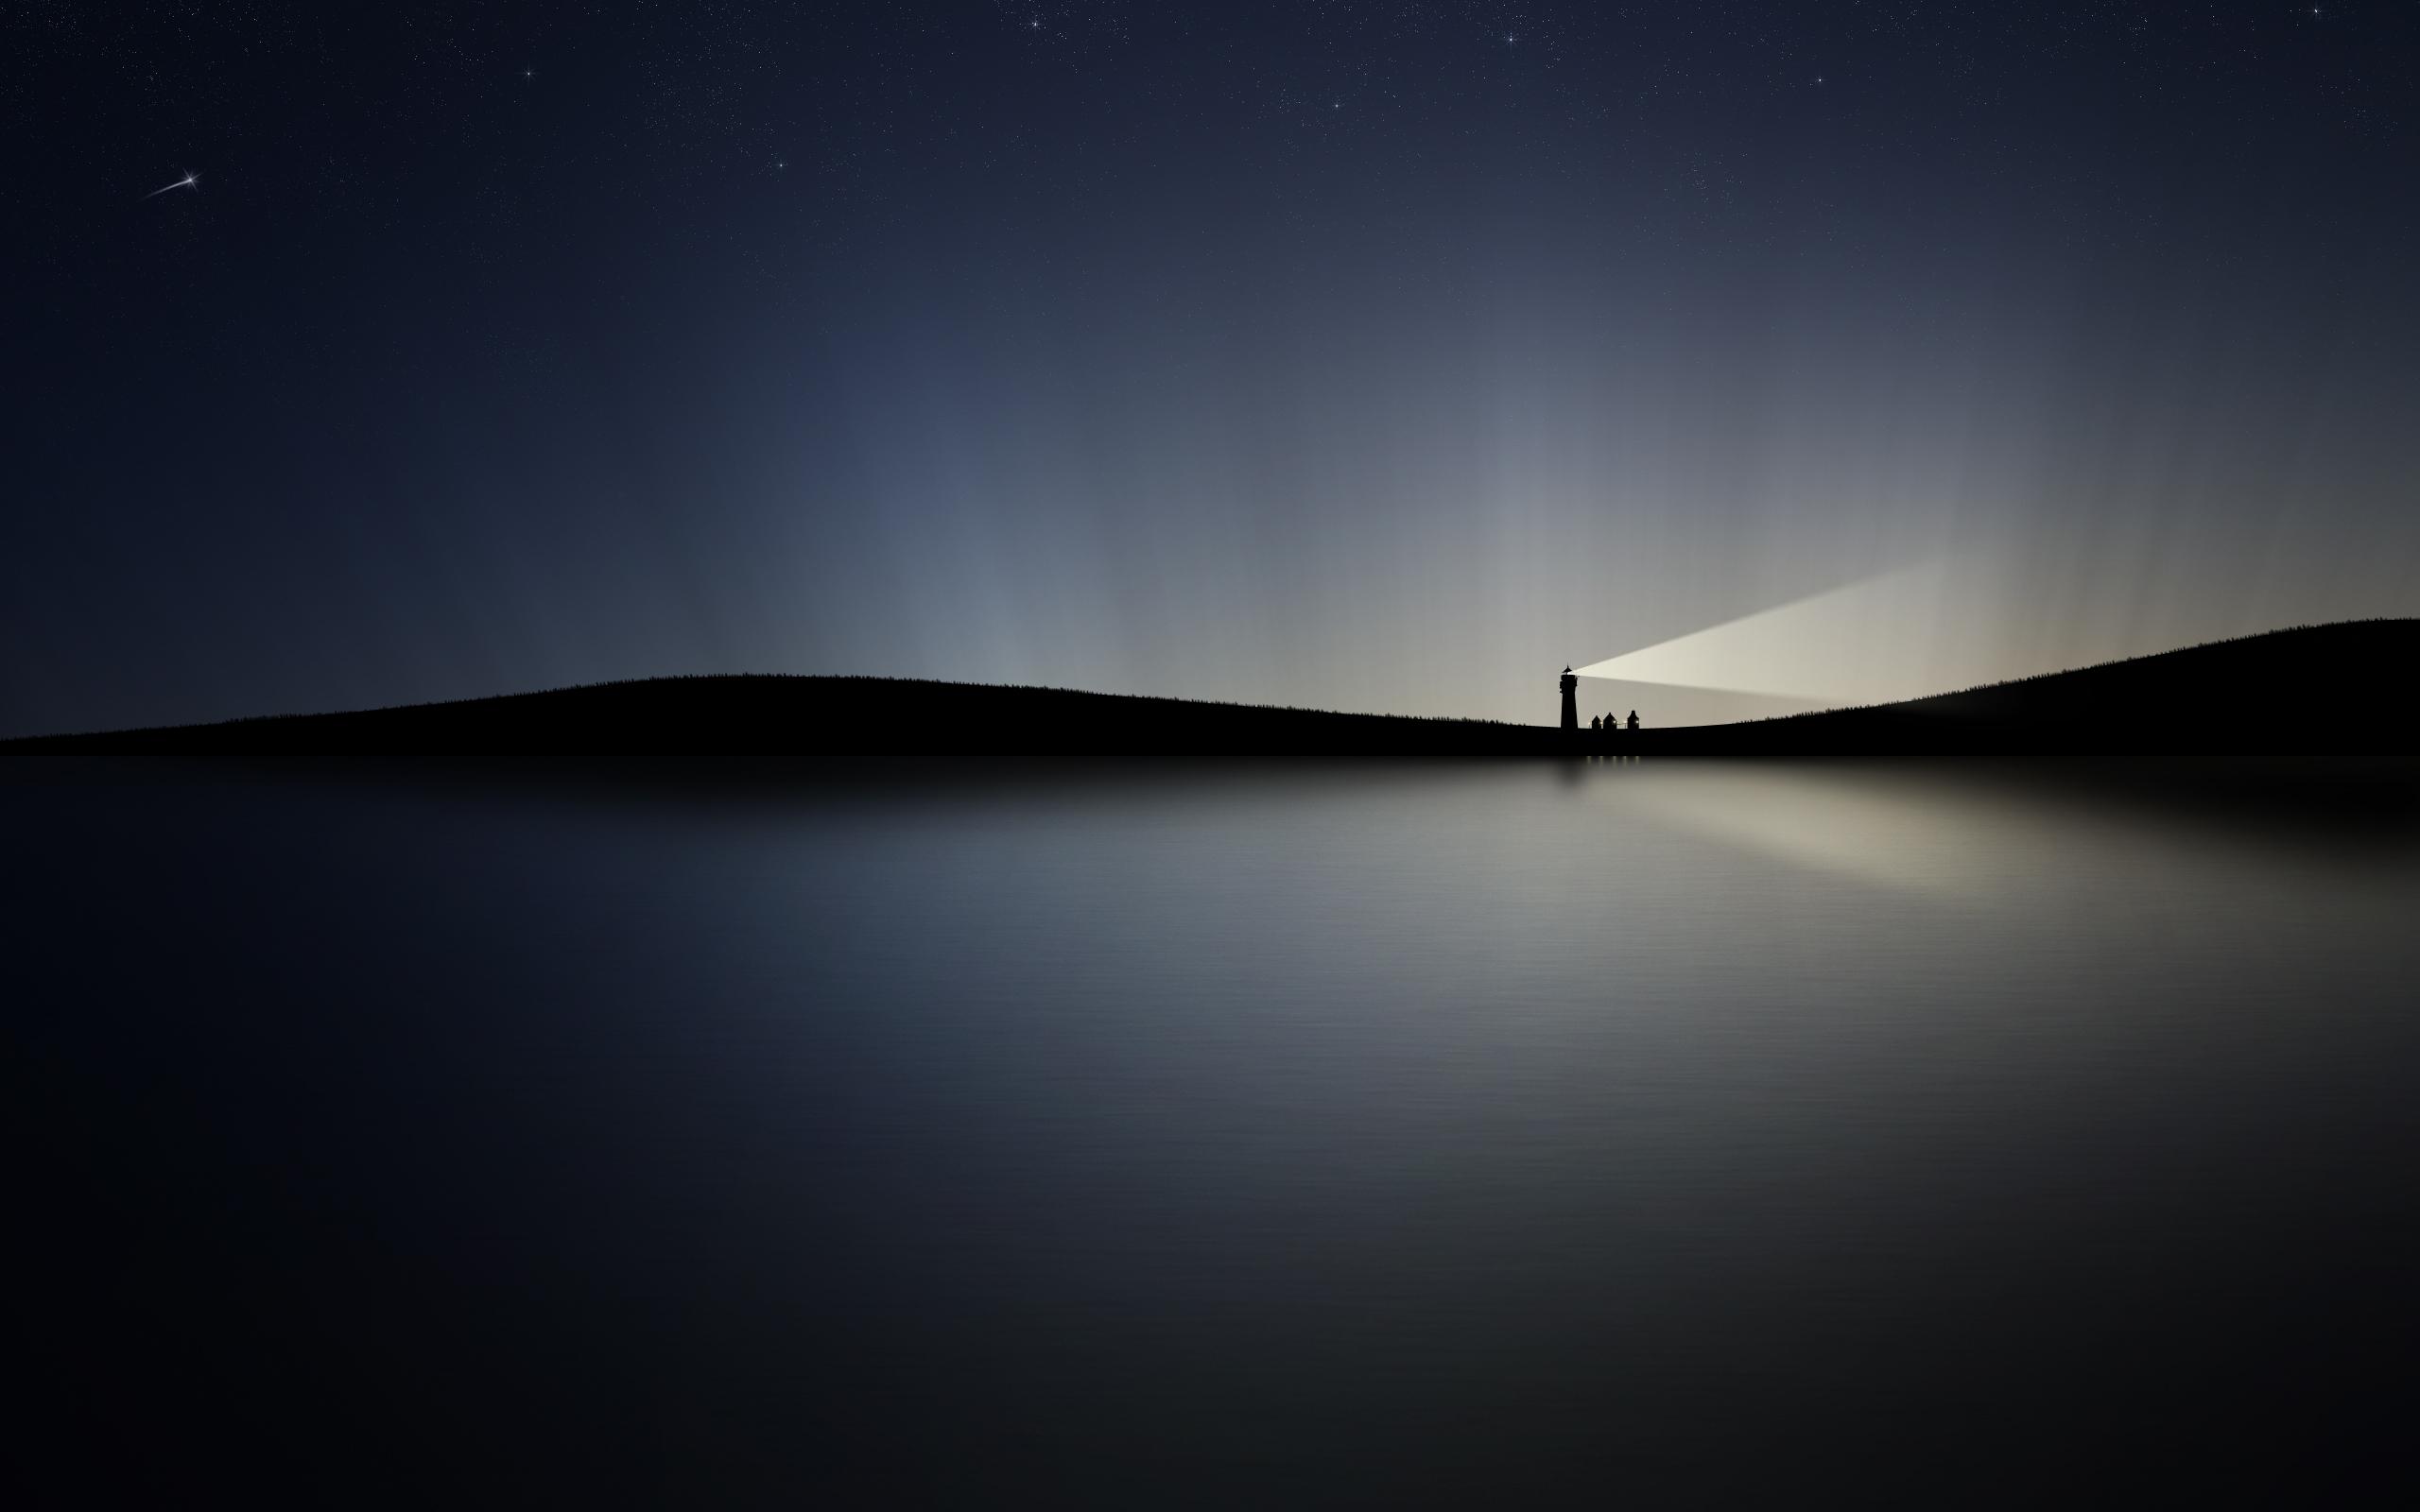 night sky wallpaper download